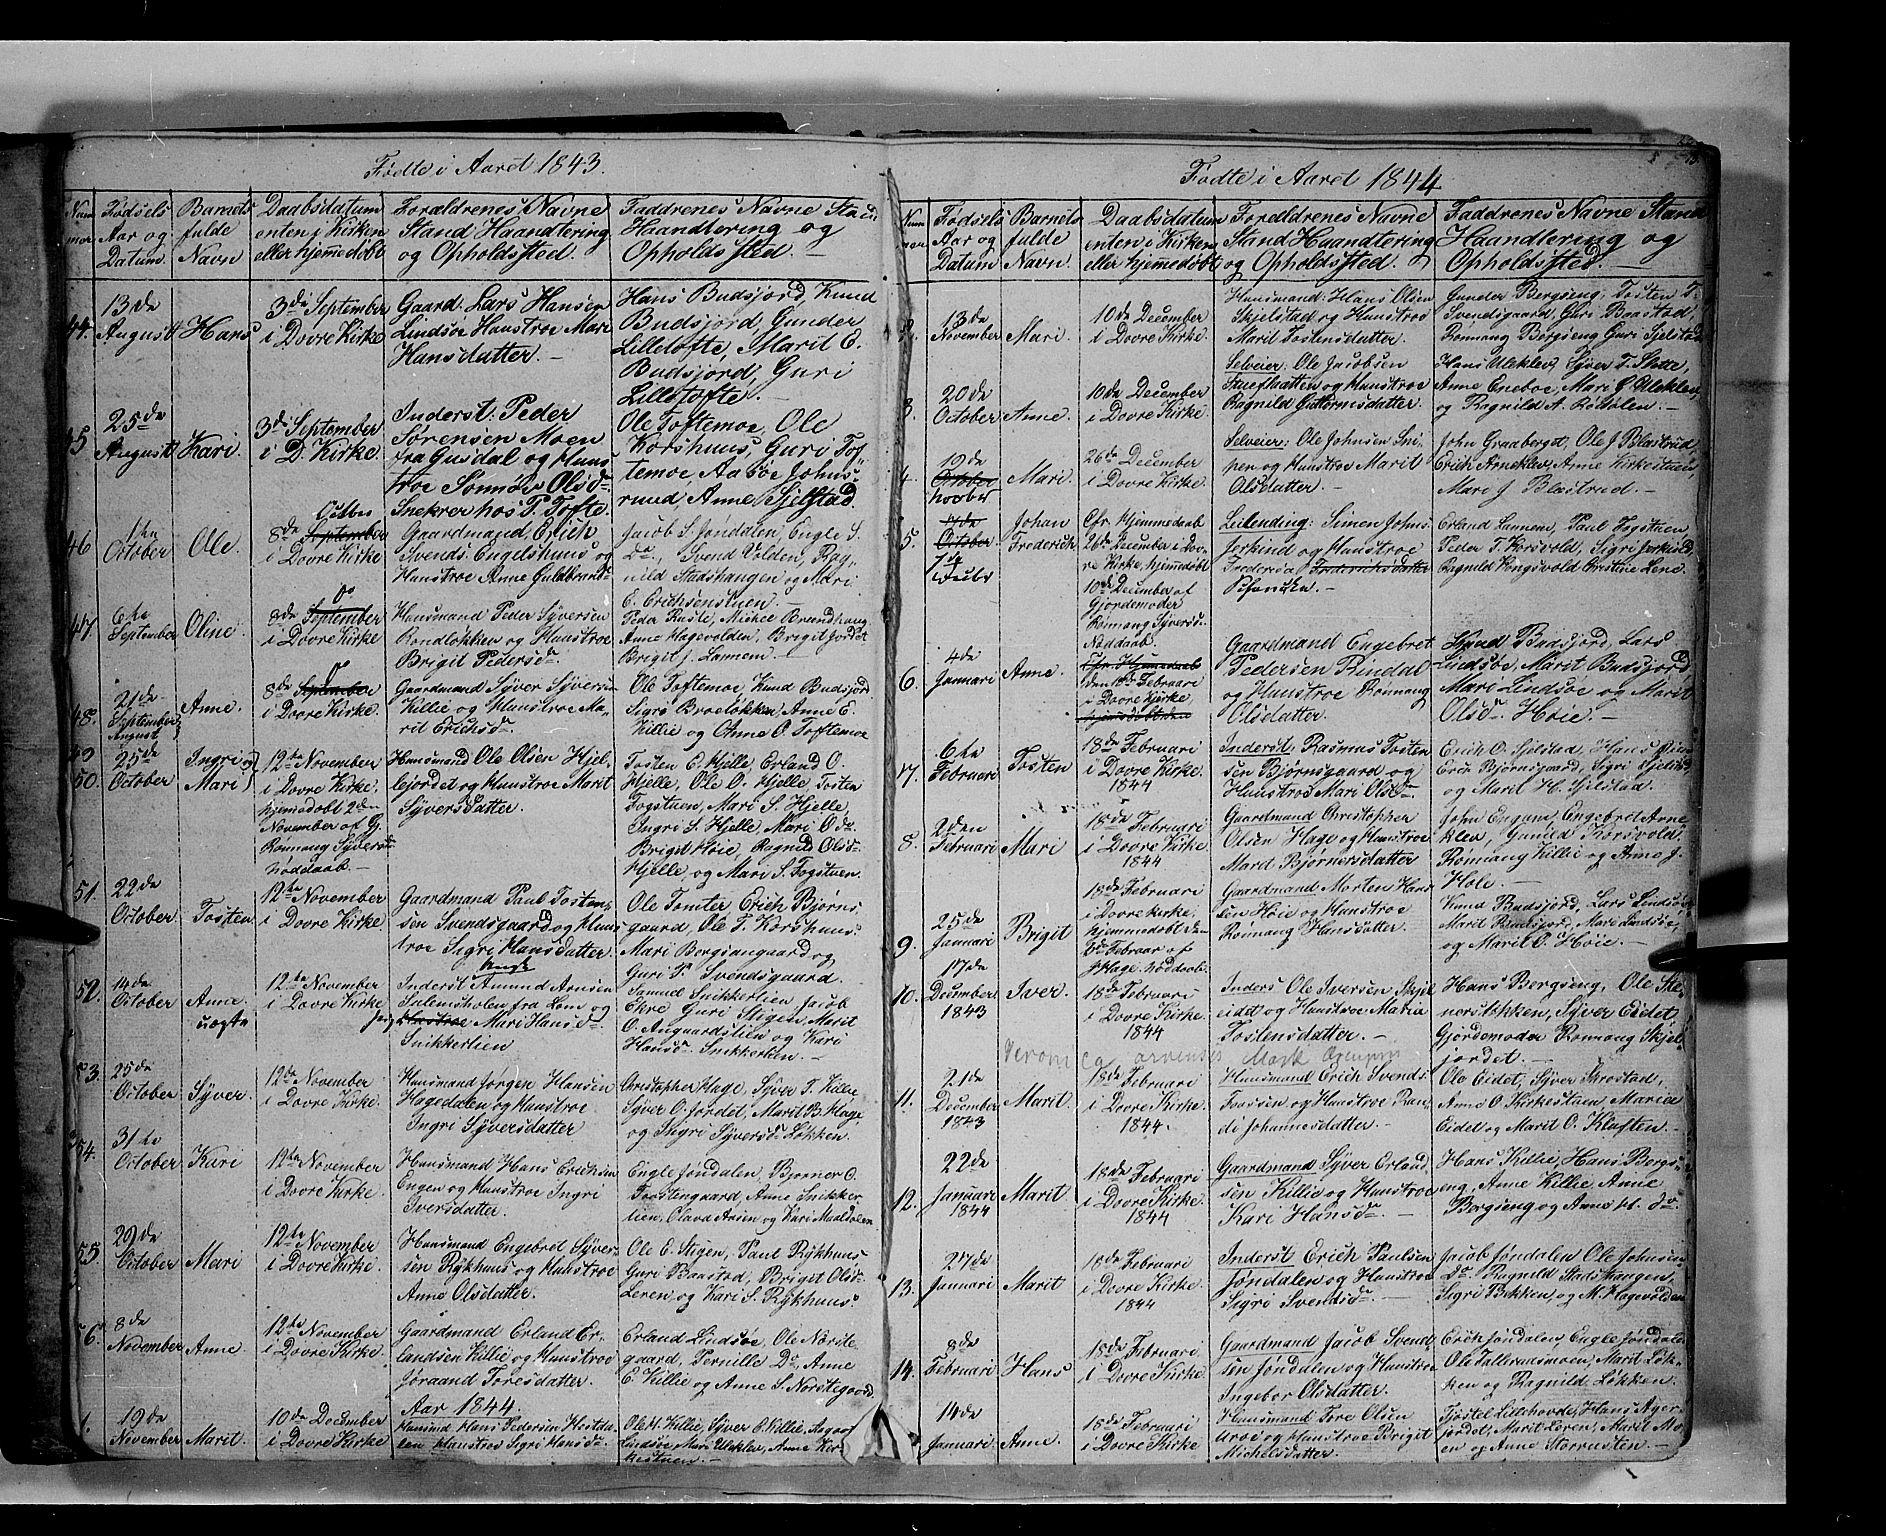 SAH, Lesja prestekontor, Klokkerbok nr. 3, 1842-1862, s. 12-13